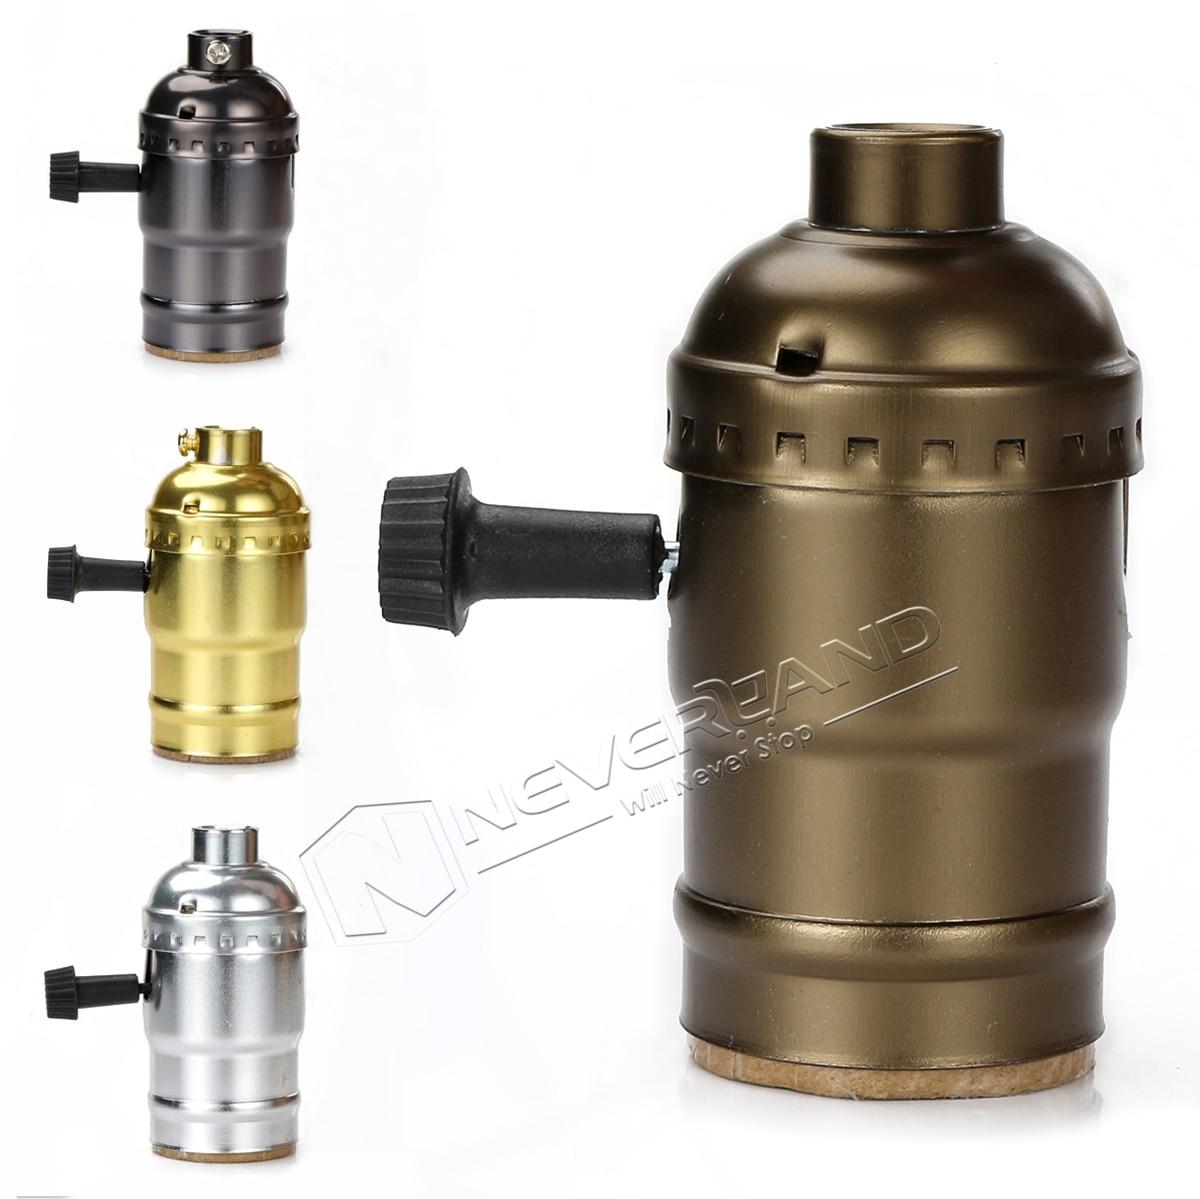 Aluminum Lamp Holder Socket With Switch E27 Pearl Black/Antique Brass/Gold/Silver DIY Lighting Fitting Vintage Light Base